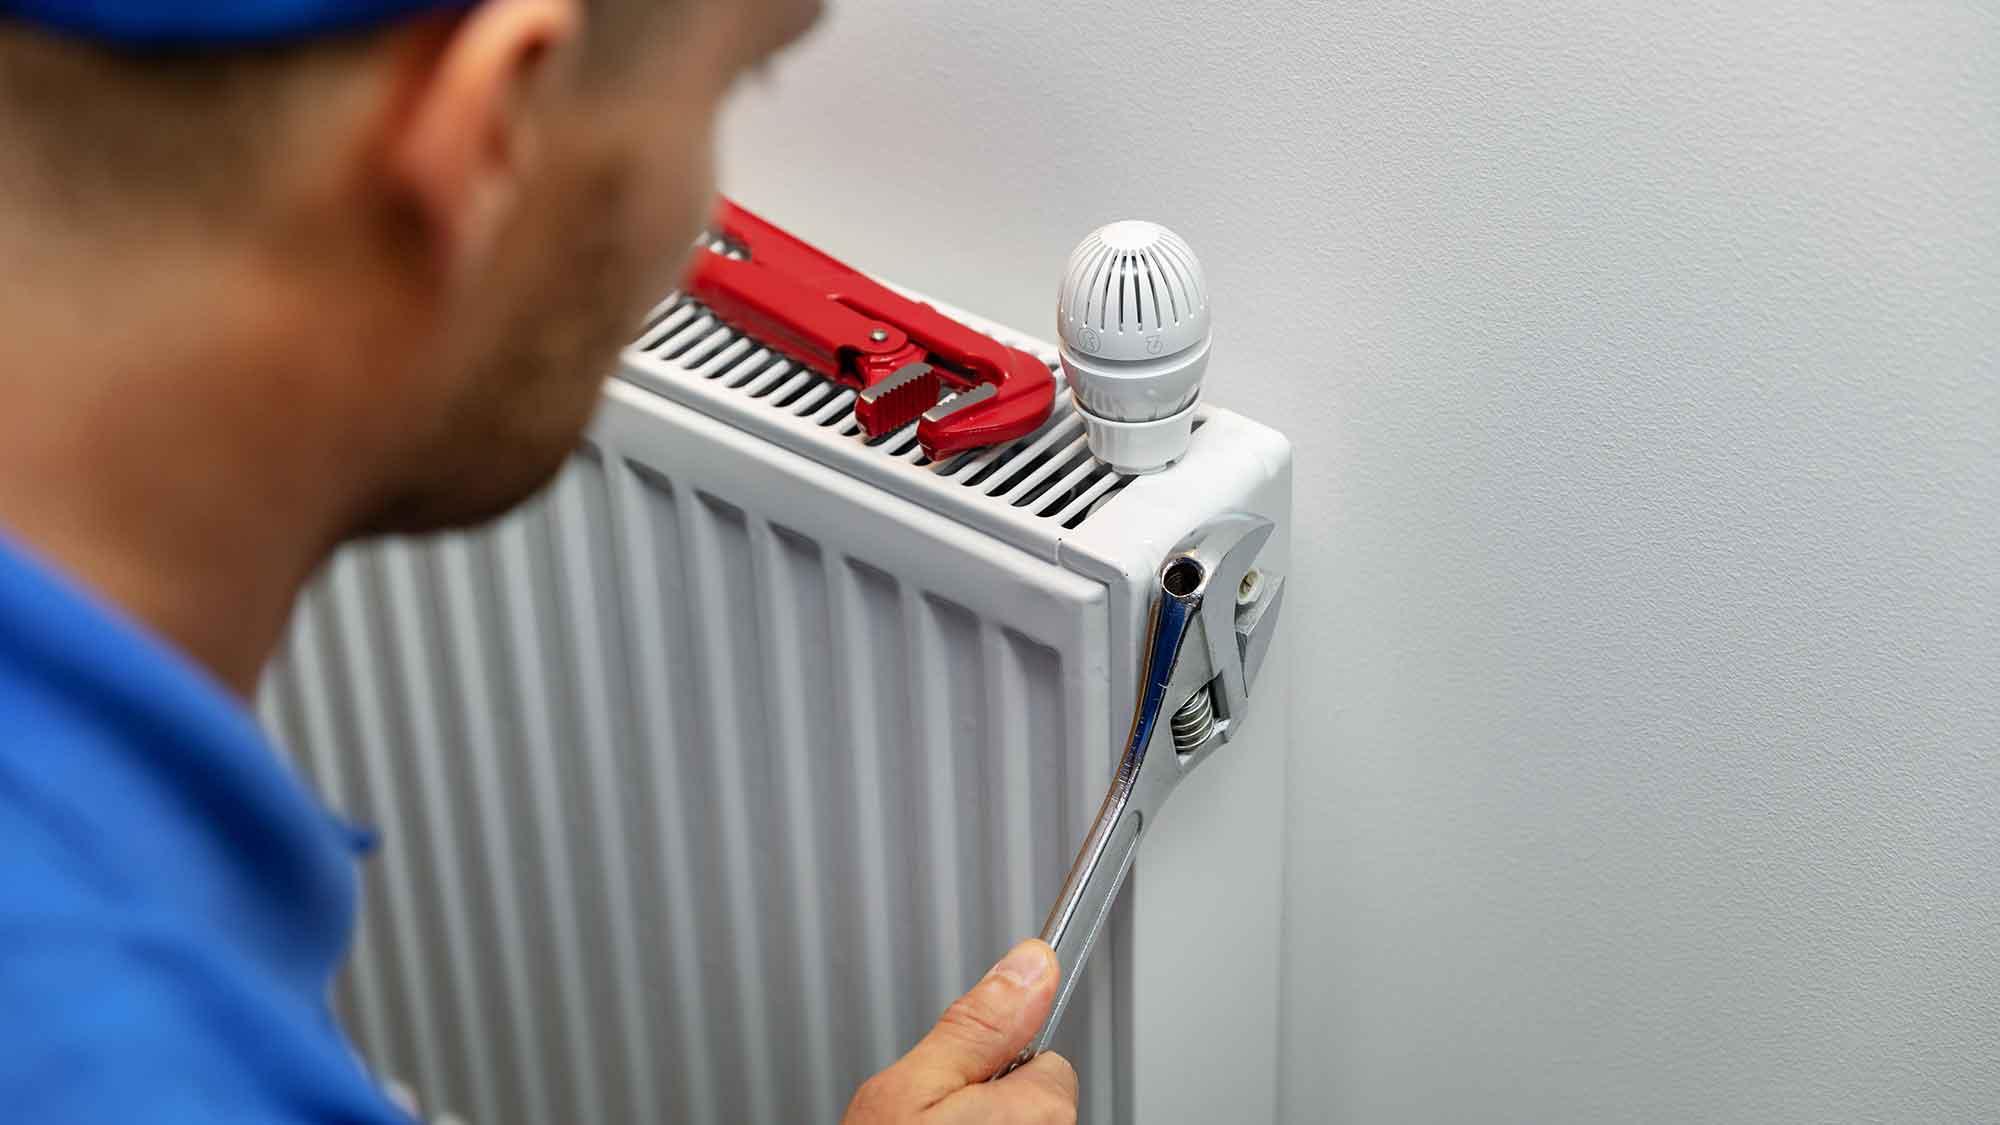 central heating installation essex maintenance leigh on sea radiator